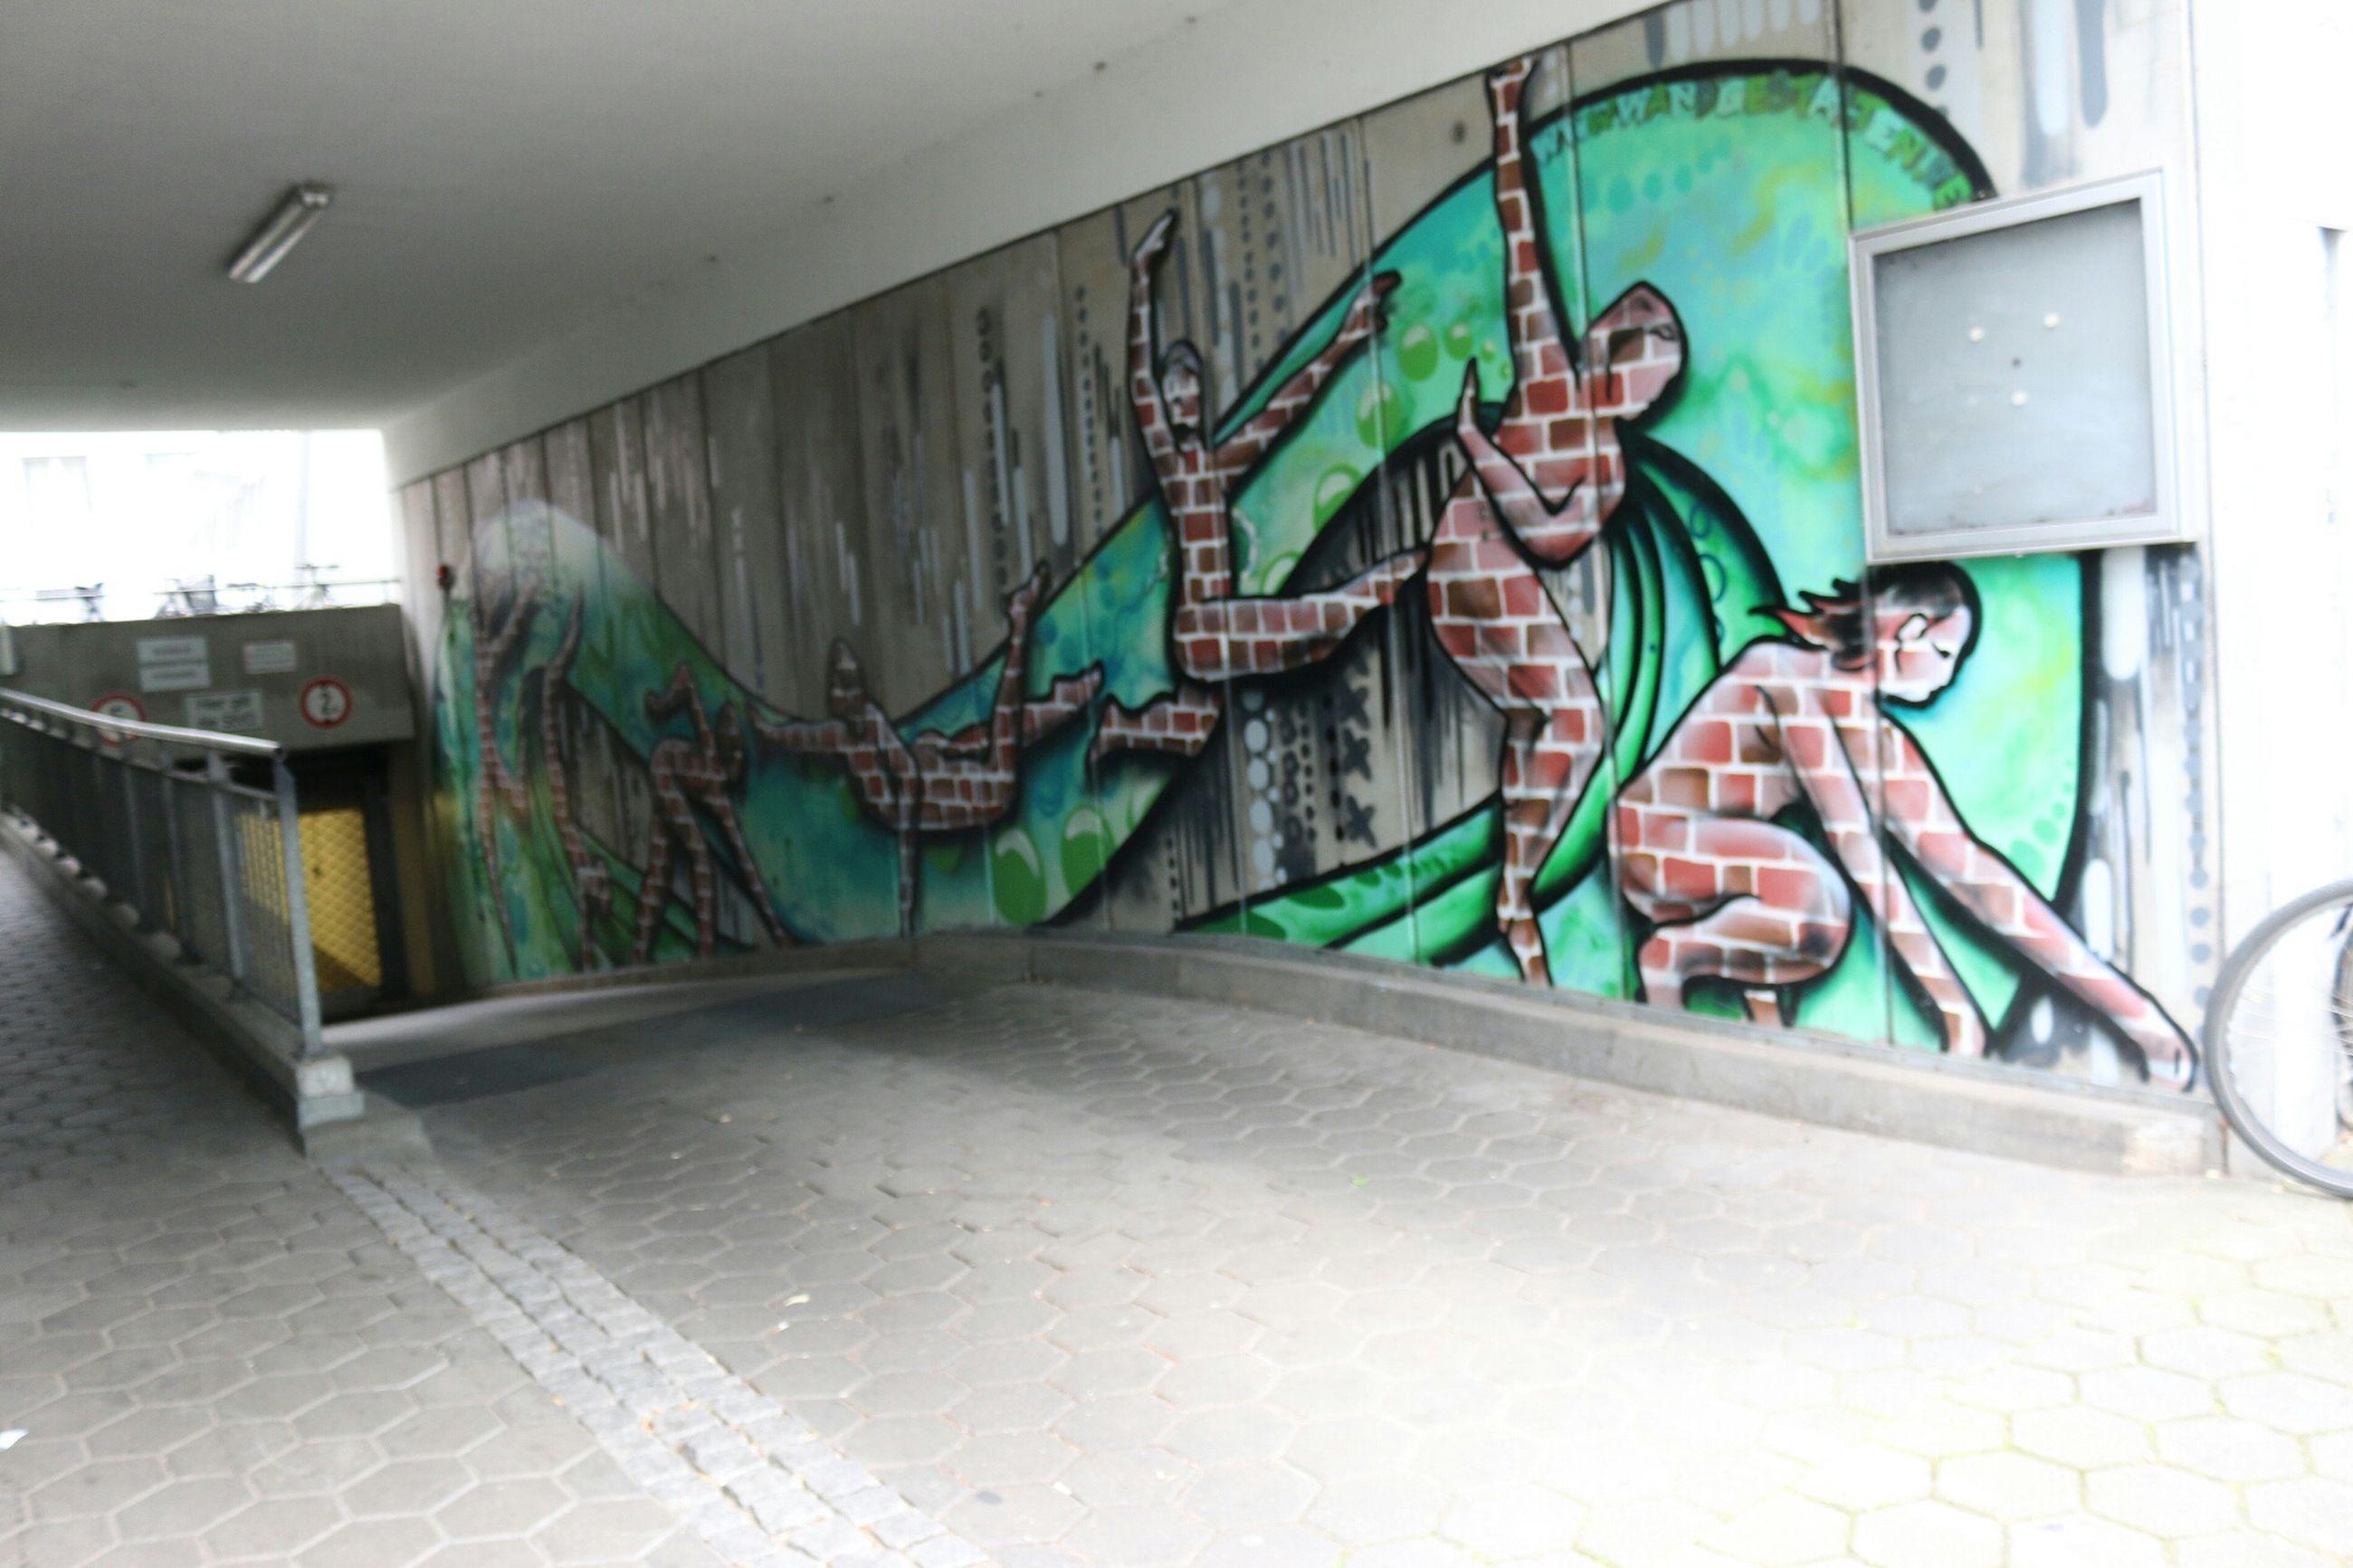 art, art and craft, creativity, indoors, architecture, built structure, graffiti, human representation, wall - building feature, animal representation, blue, sculpture, no people, railing, wall, statue, building exterior, street art